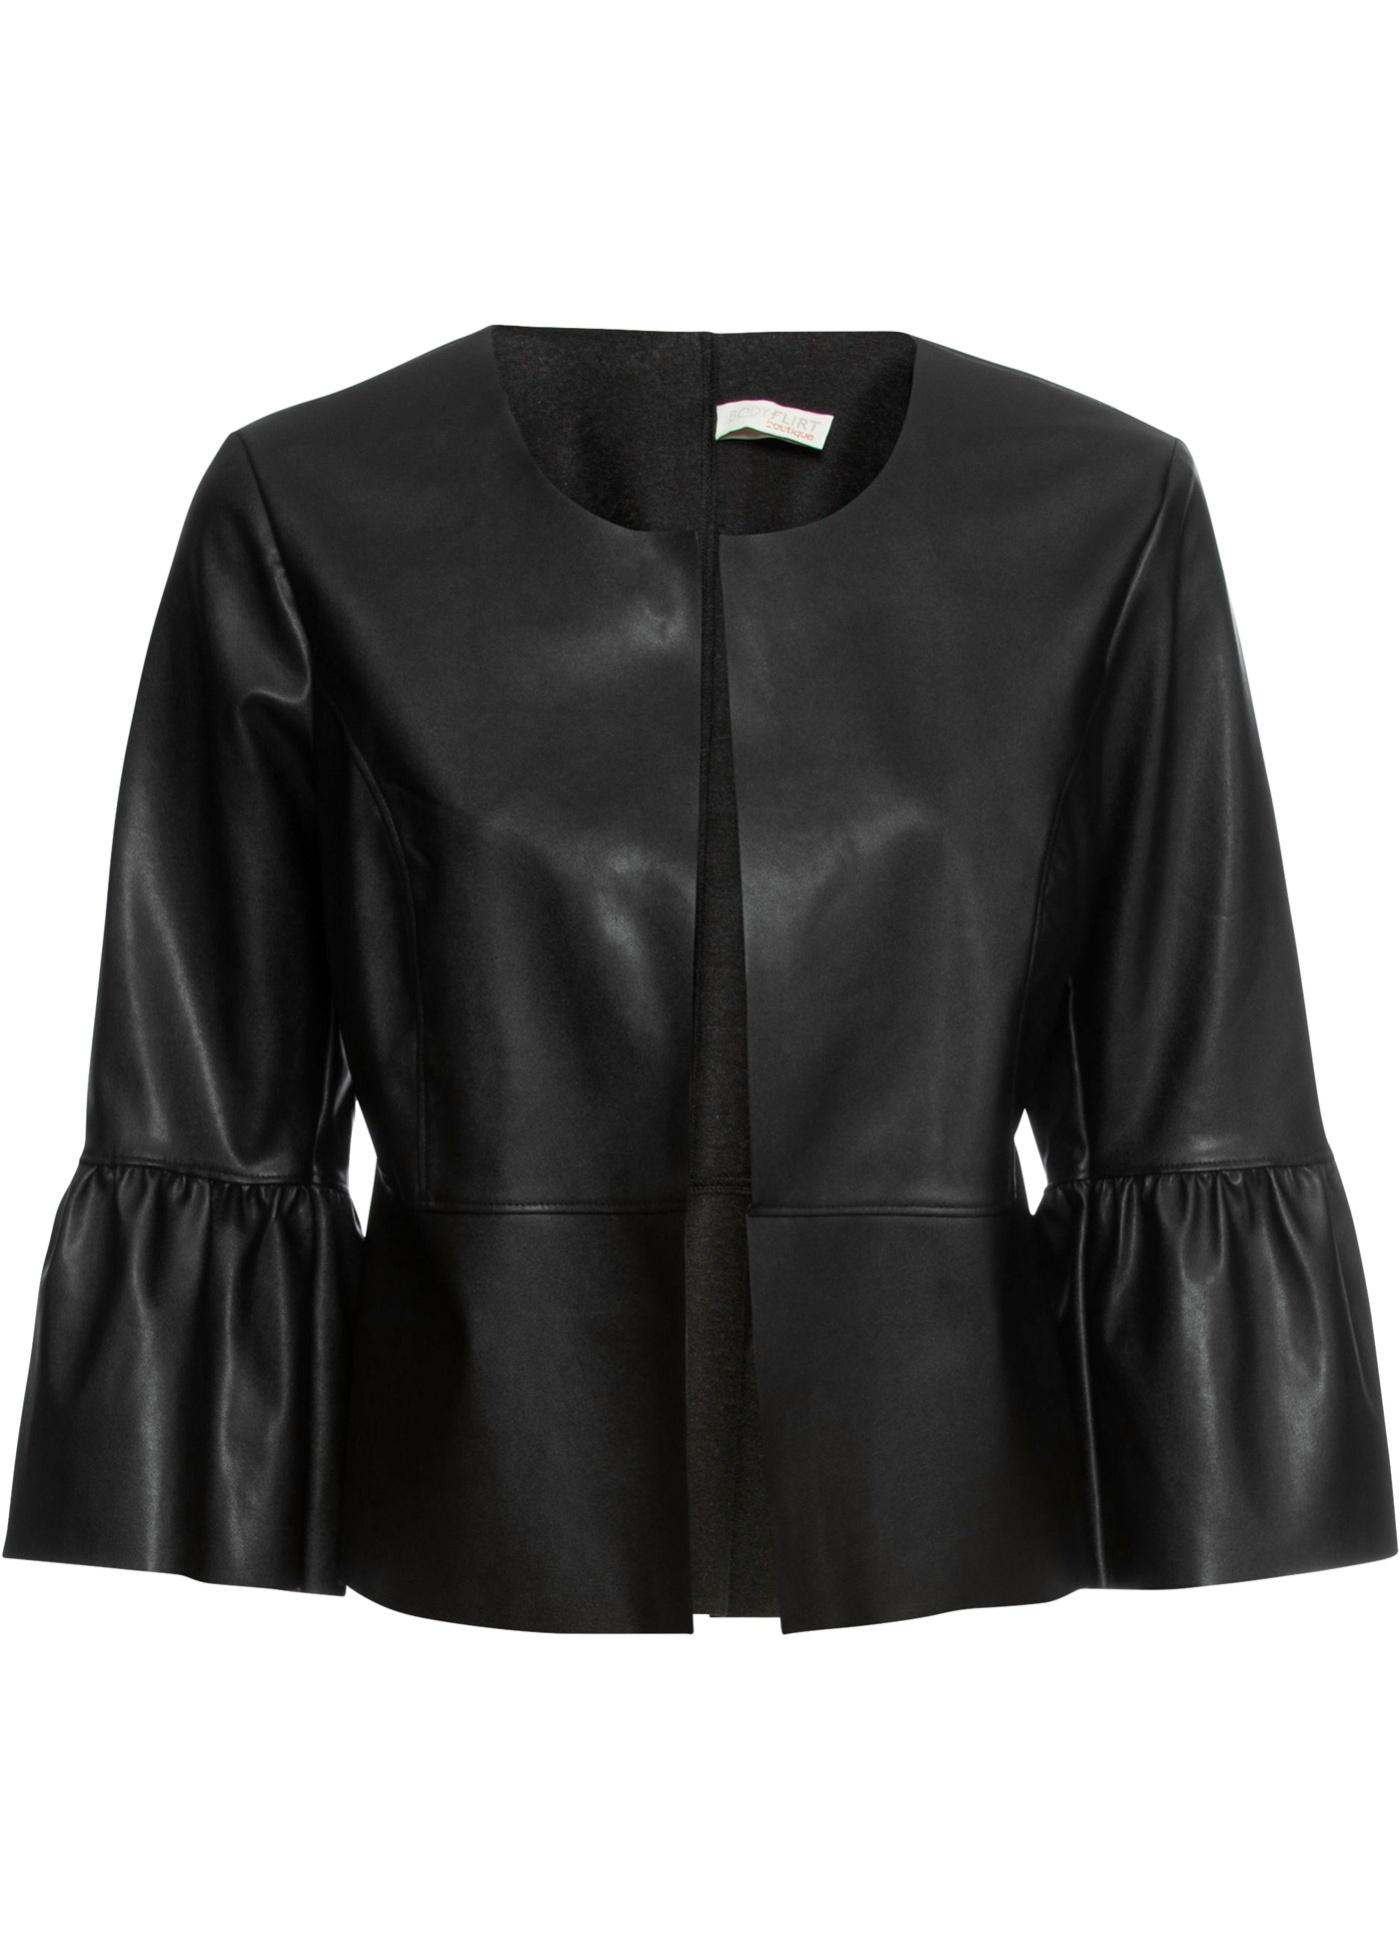 Blazer corto in similpelle (Nero) - BODYFLIRT boutique